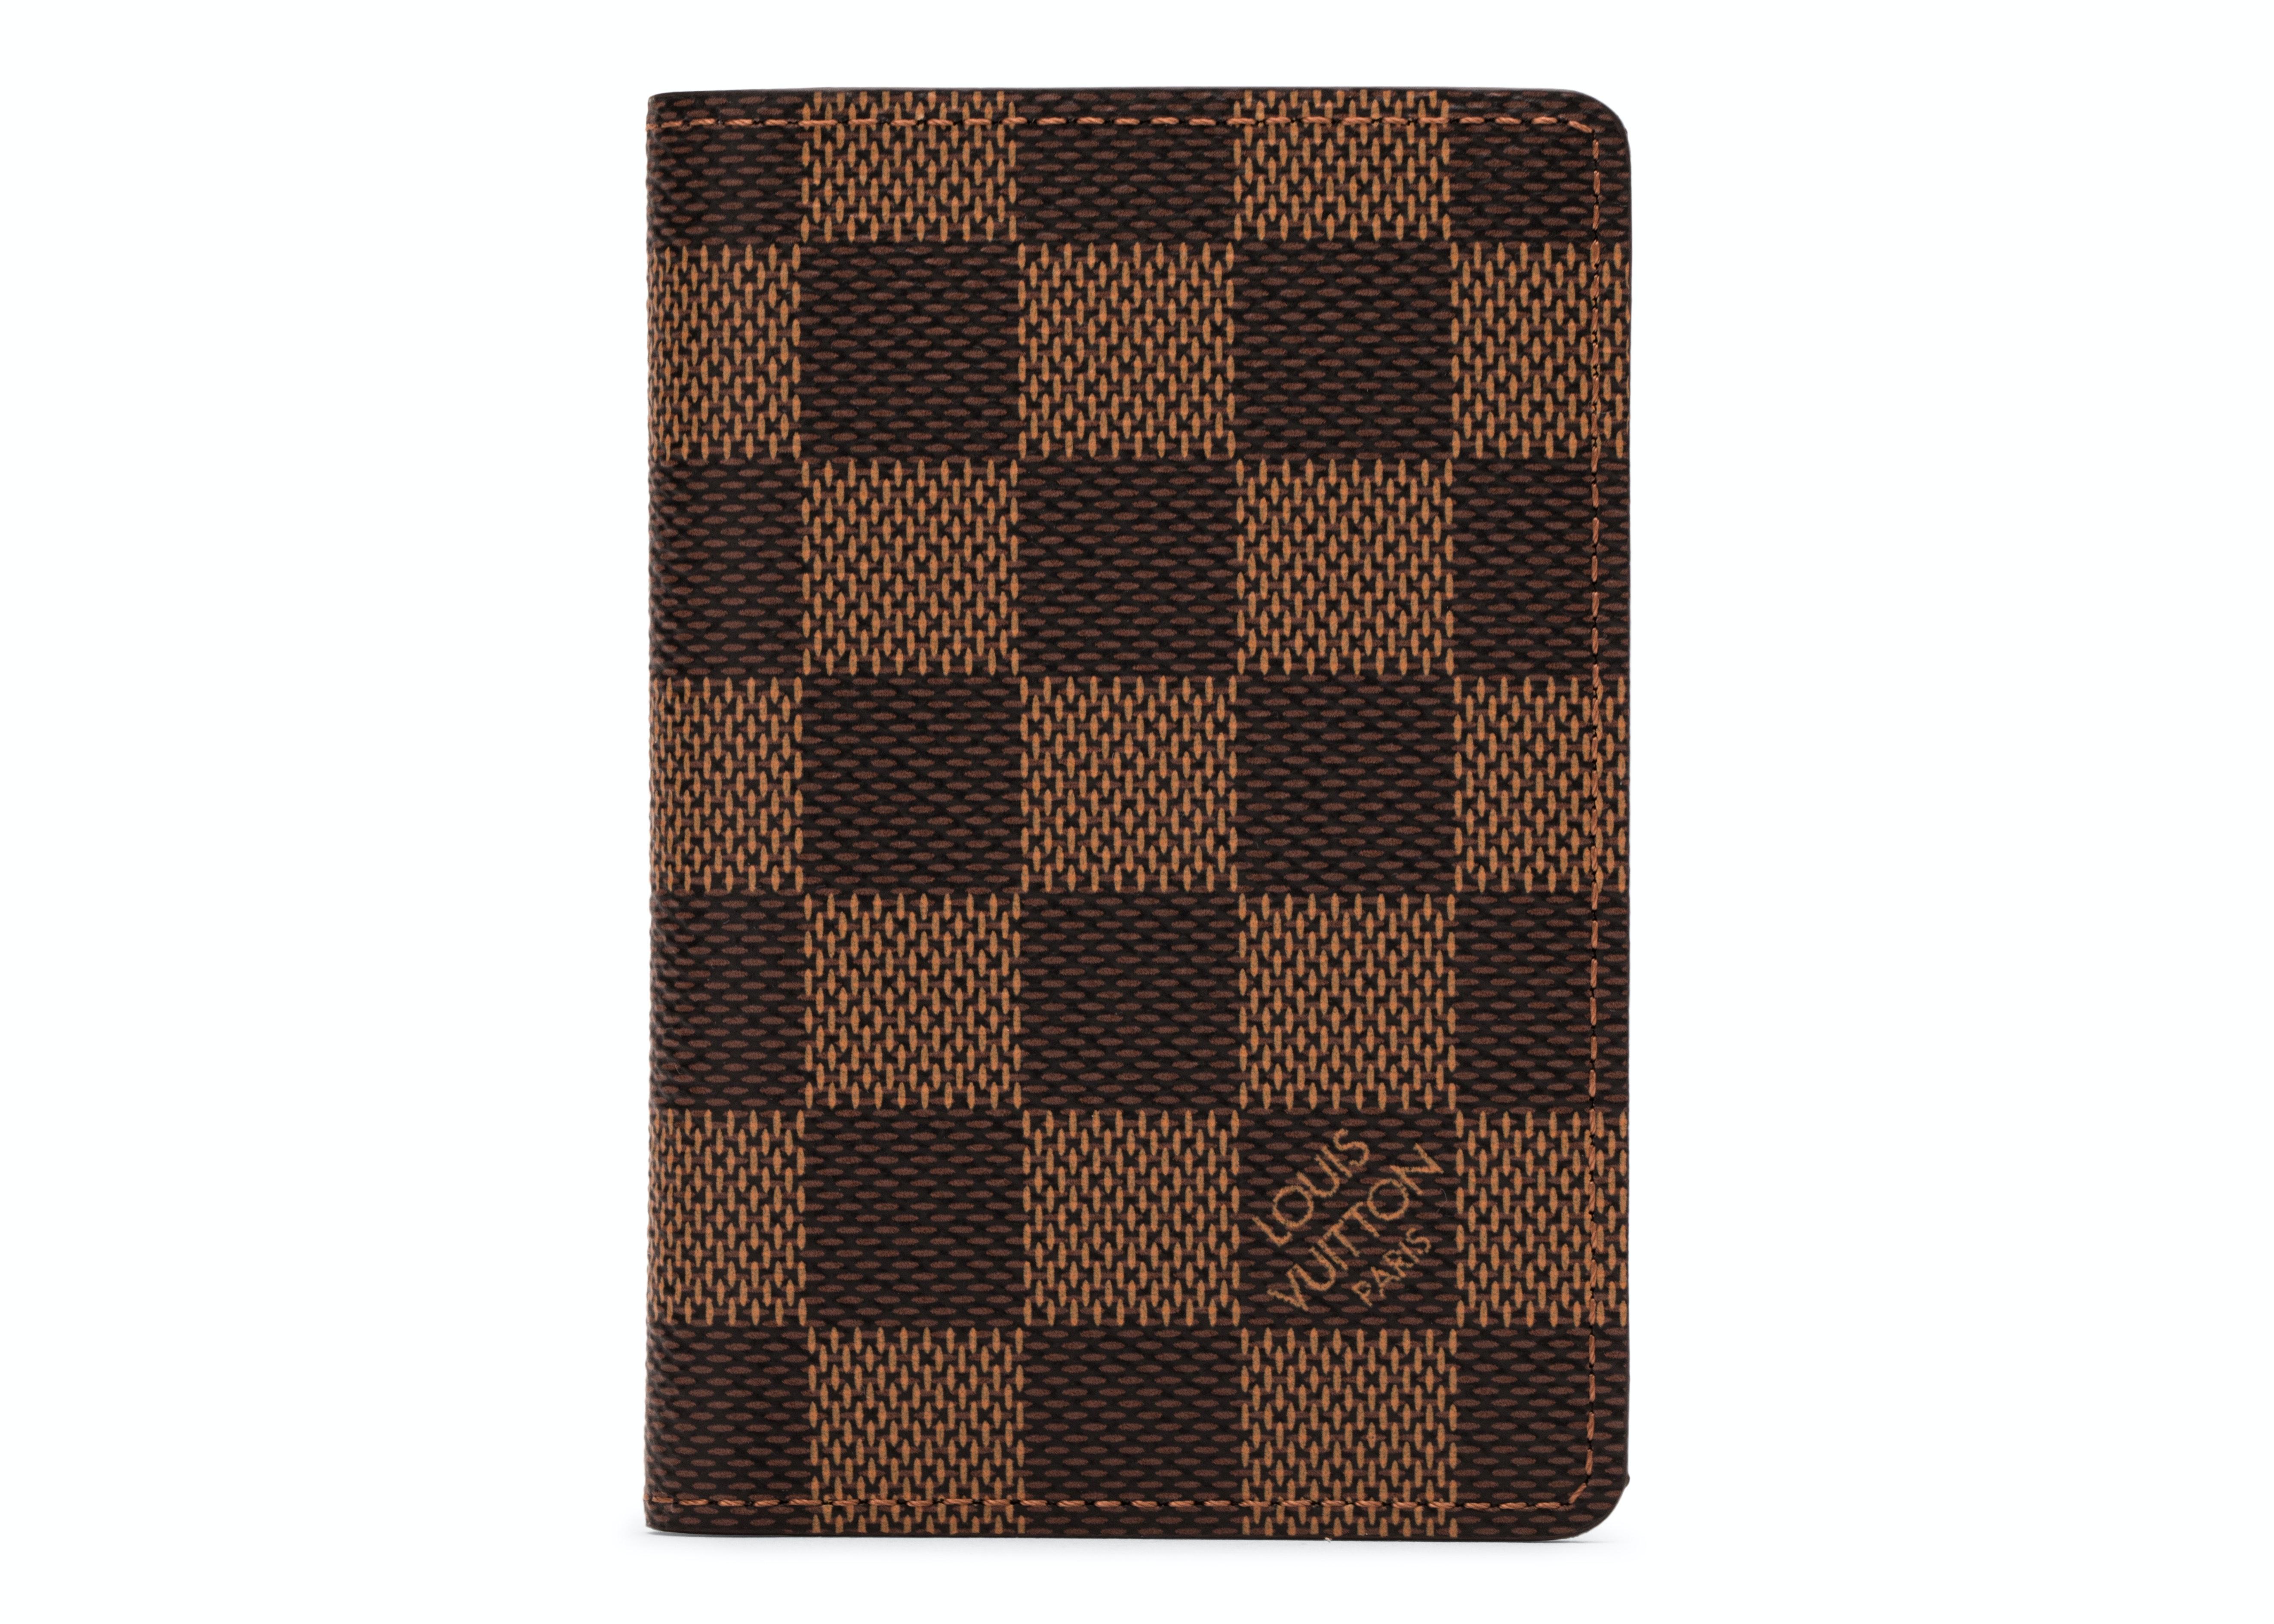 Louis Vuitton Pocket Organizer Damier Ebene NM Brown